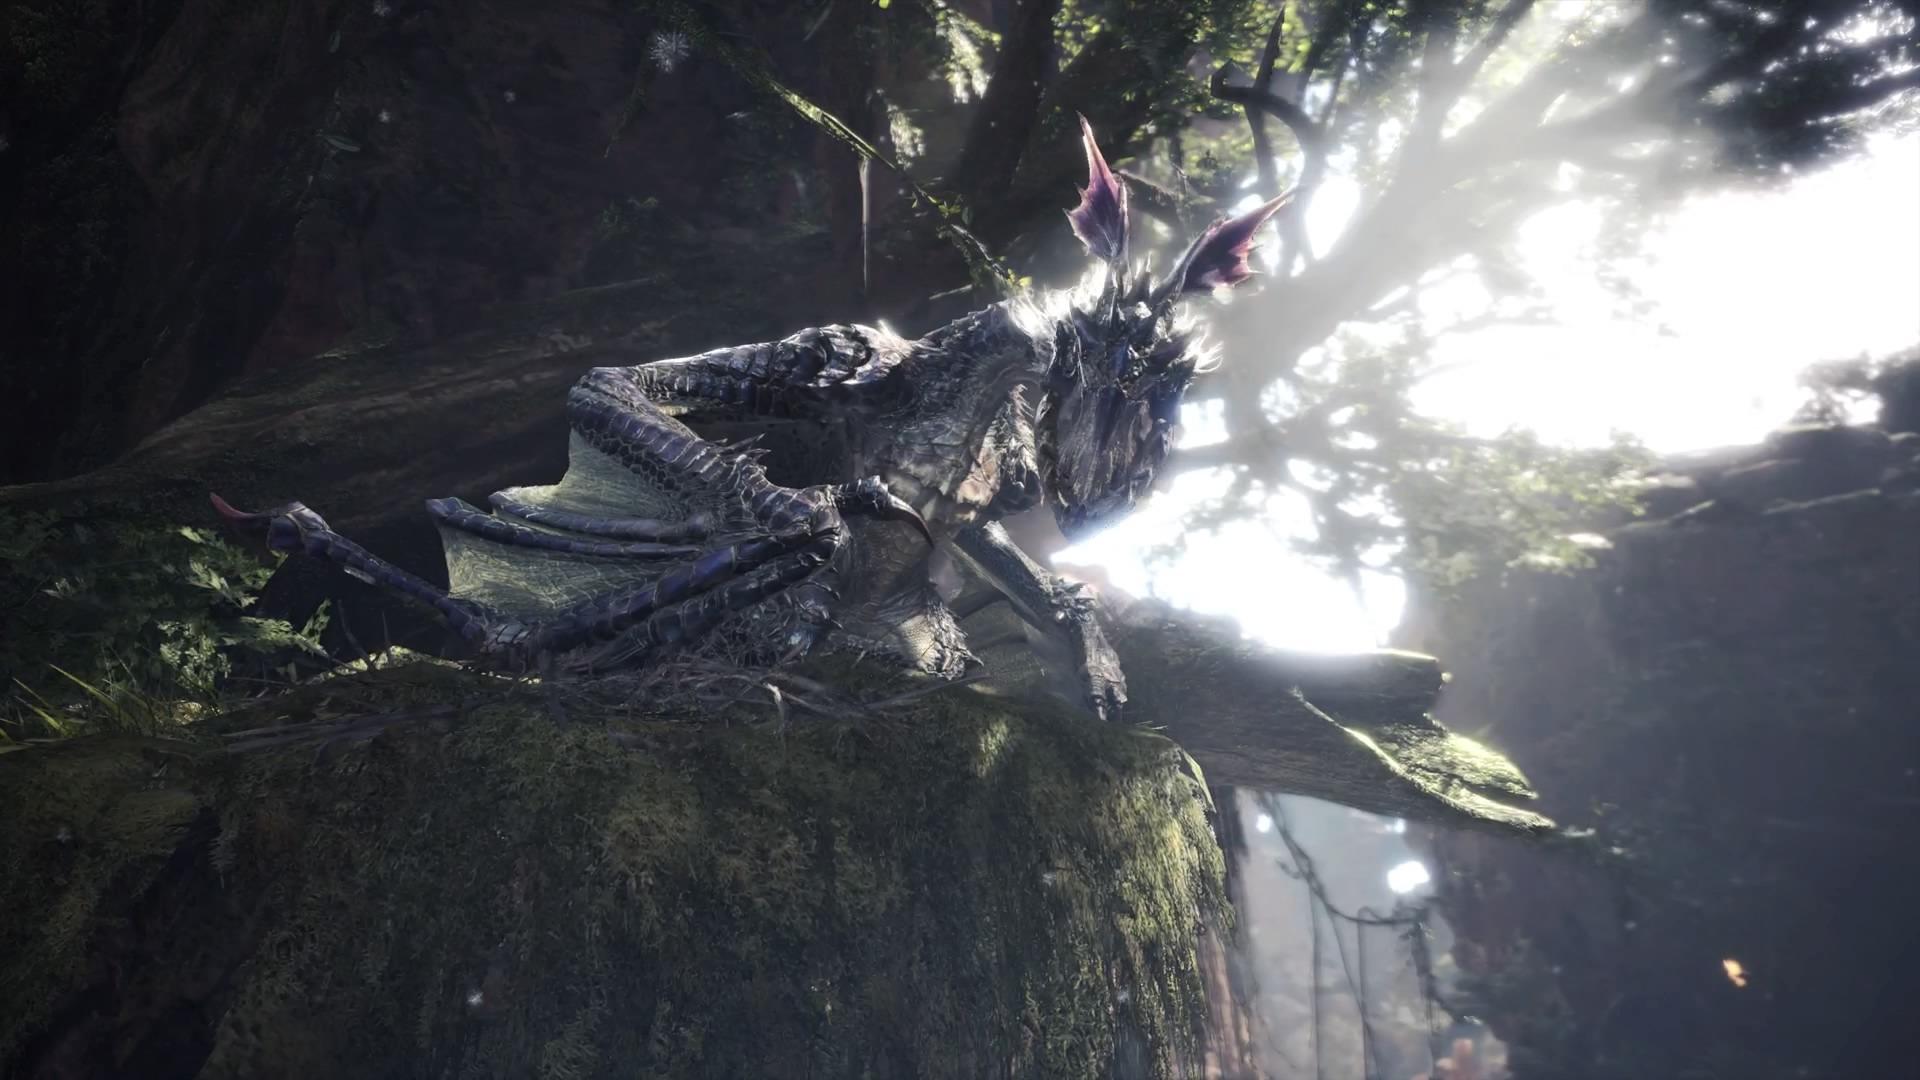 Mhw アイスボーン イャンガルルガの初期位置と出し方 カネノナルゲームブログ